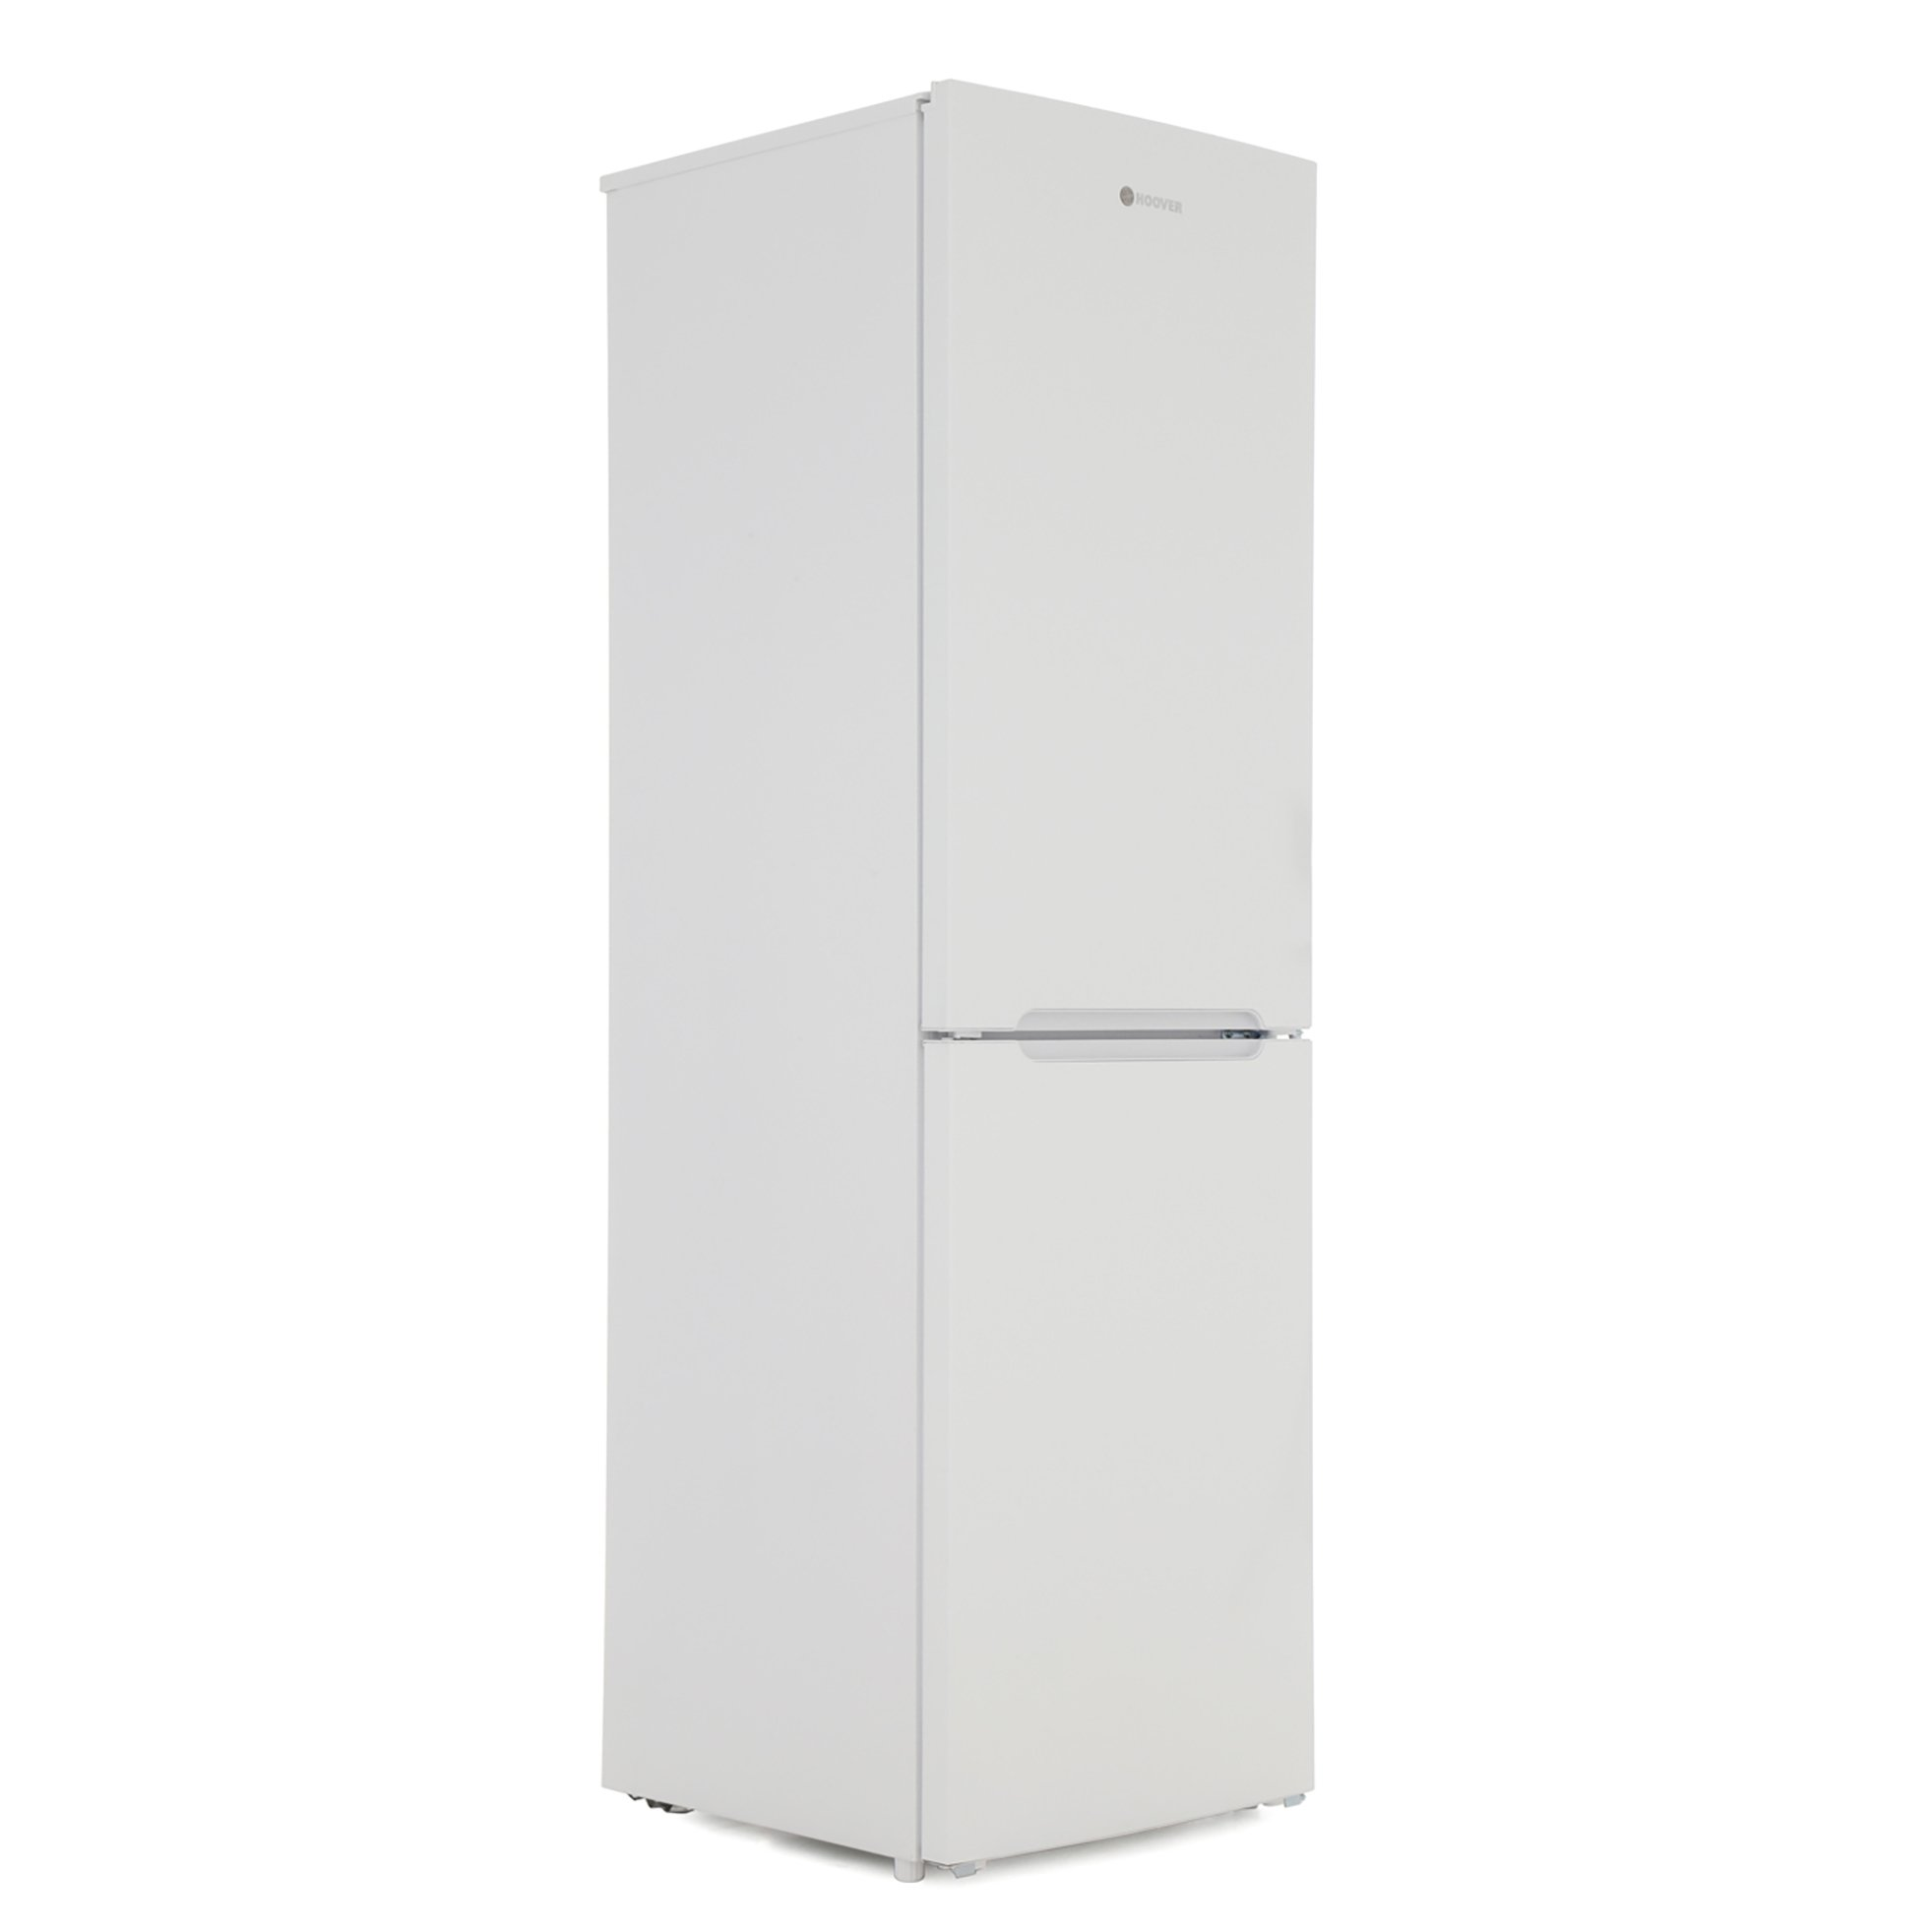 Hoover HCF5172WK Frost Free Fridge Freezer